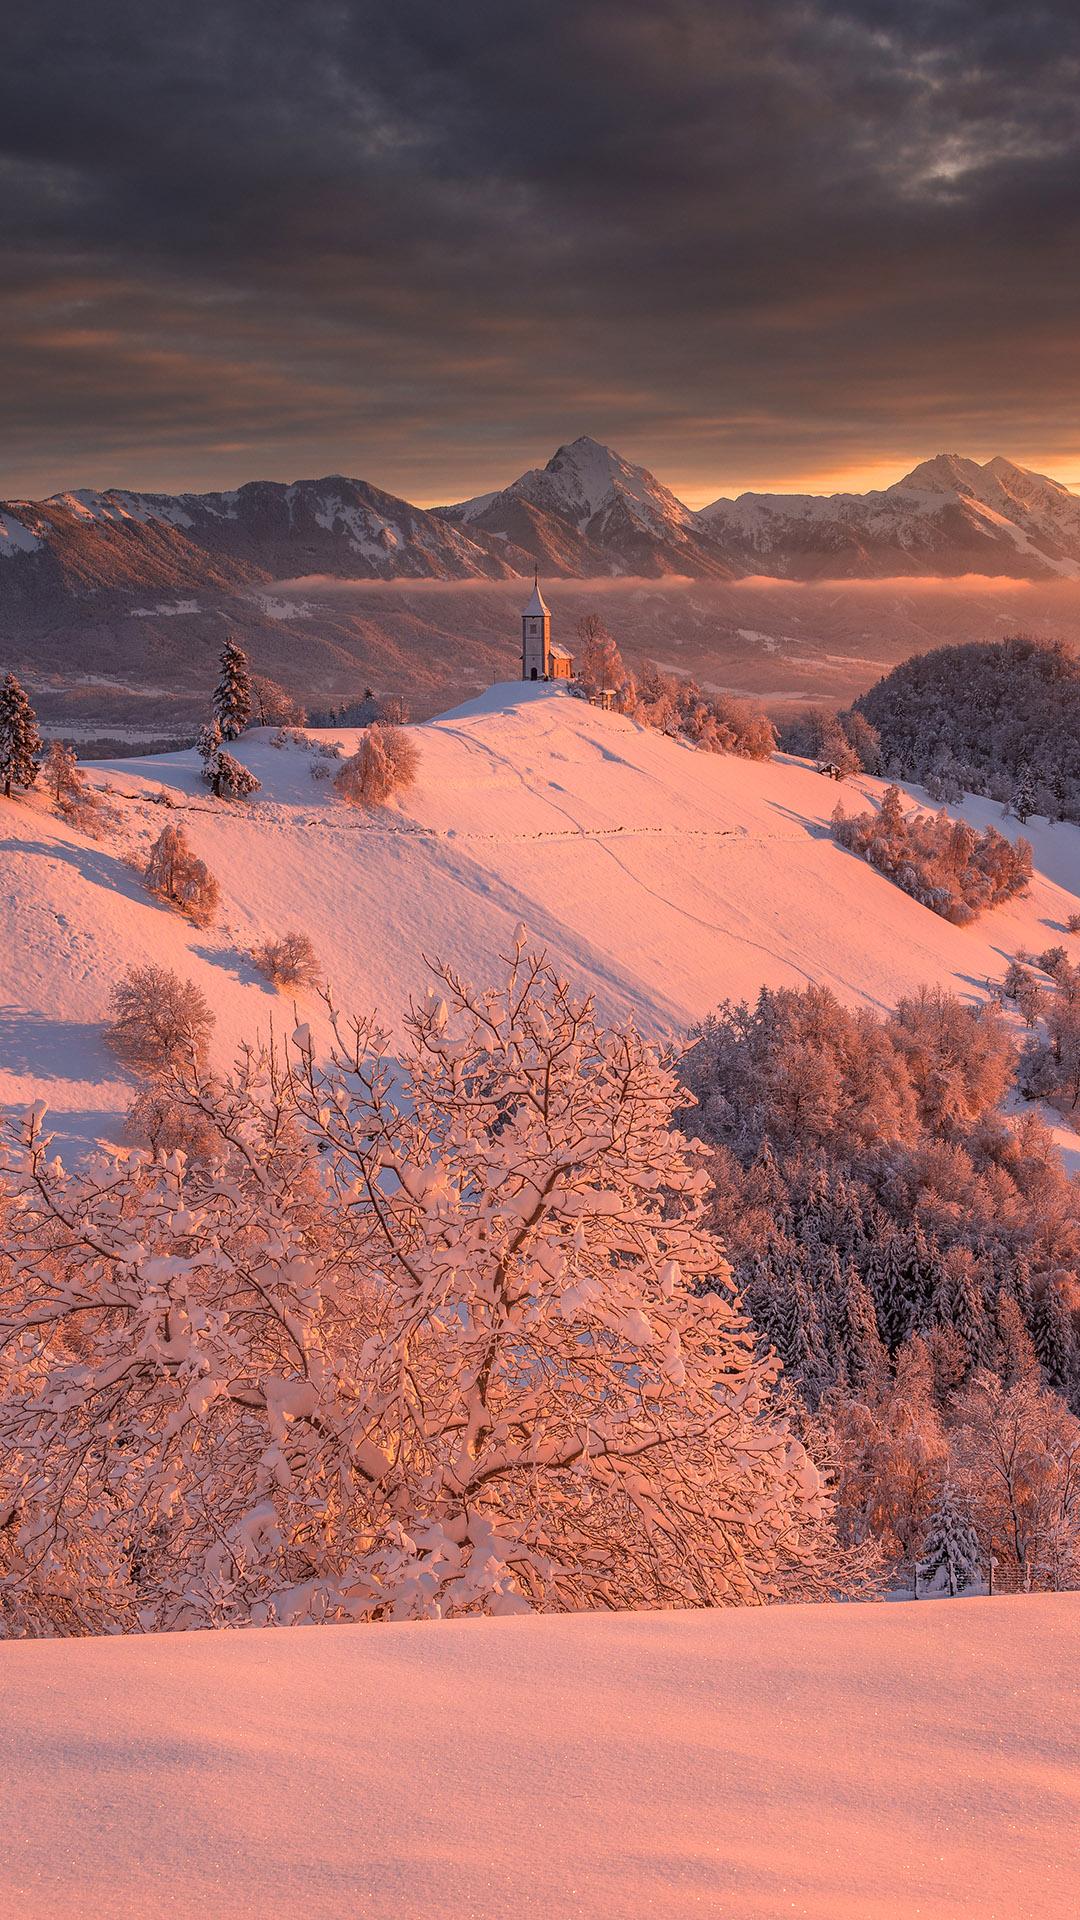 Dreamy Pixel Free Iphone Wallpaper Winter Landscape At